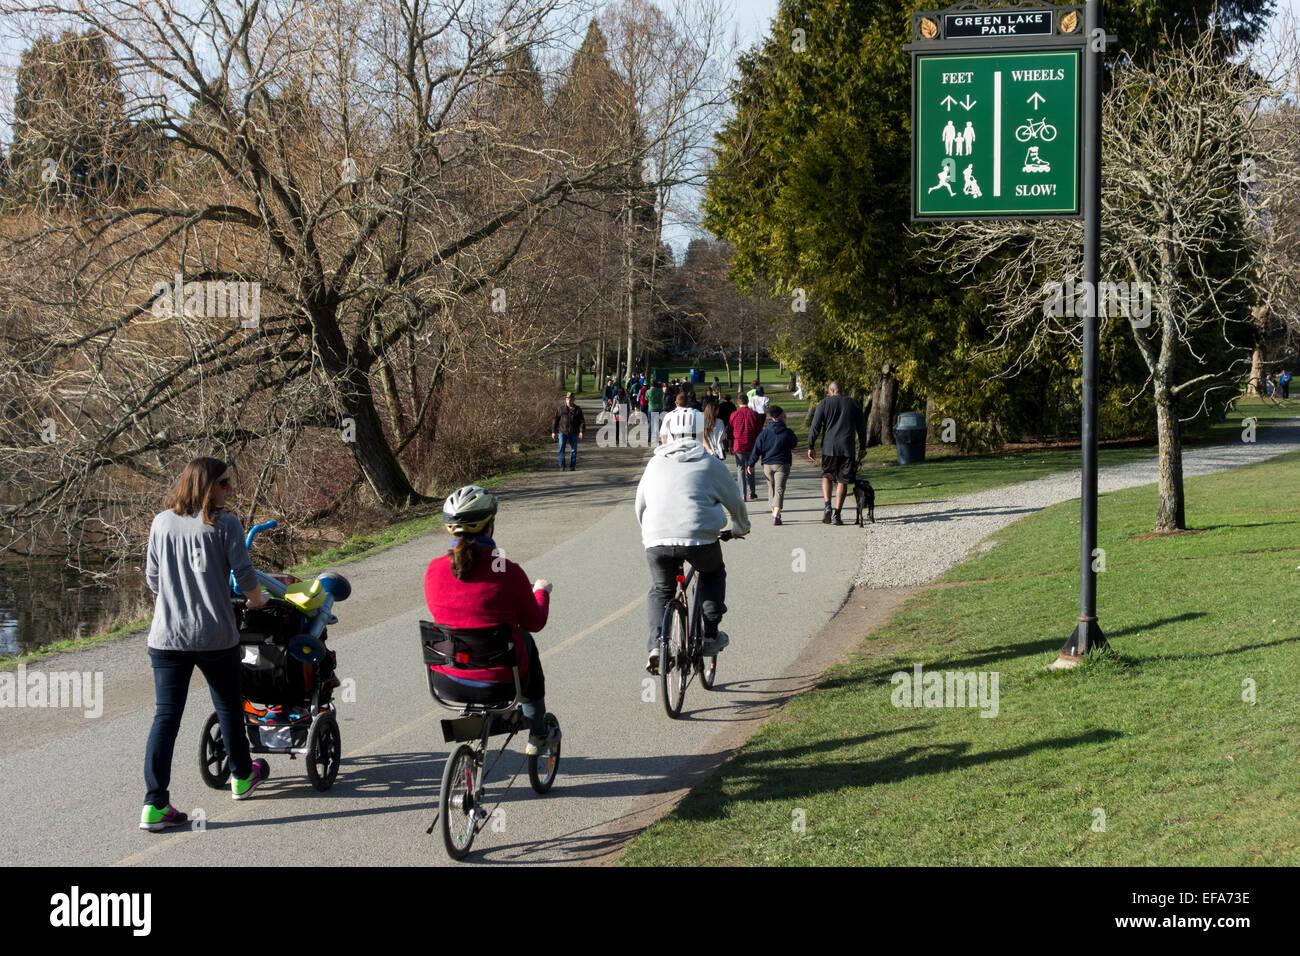 pedestrian and wheeled traffic at Green Lake Park, Seattle, Washington State, USA - Stock Image